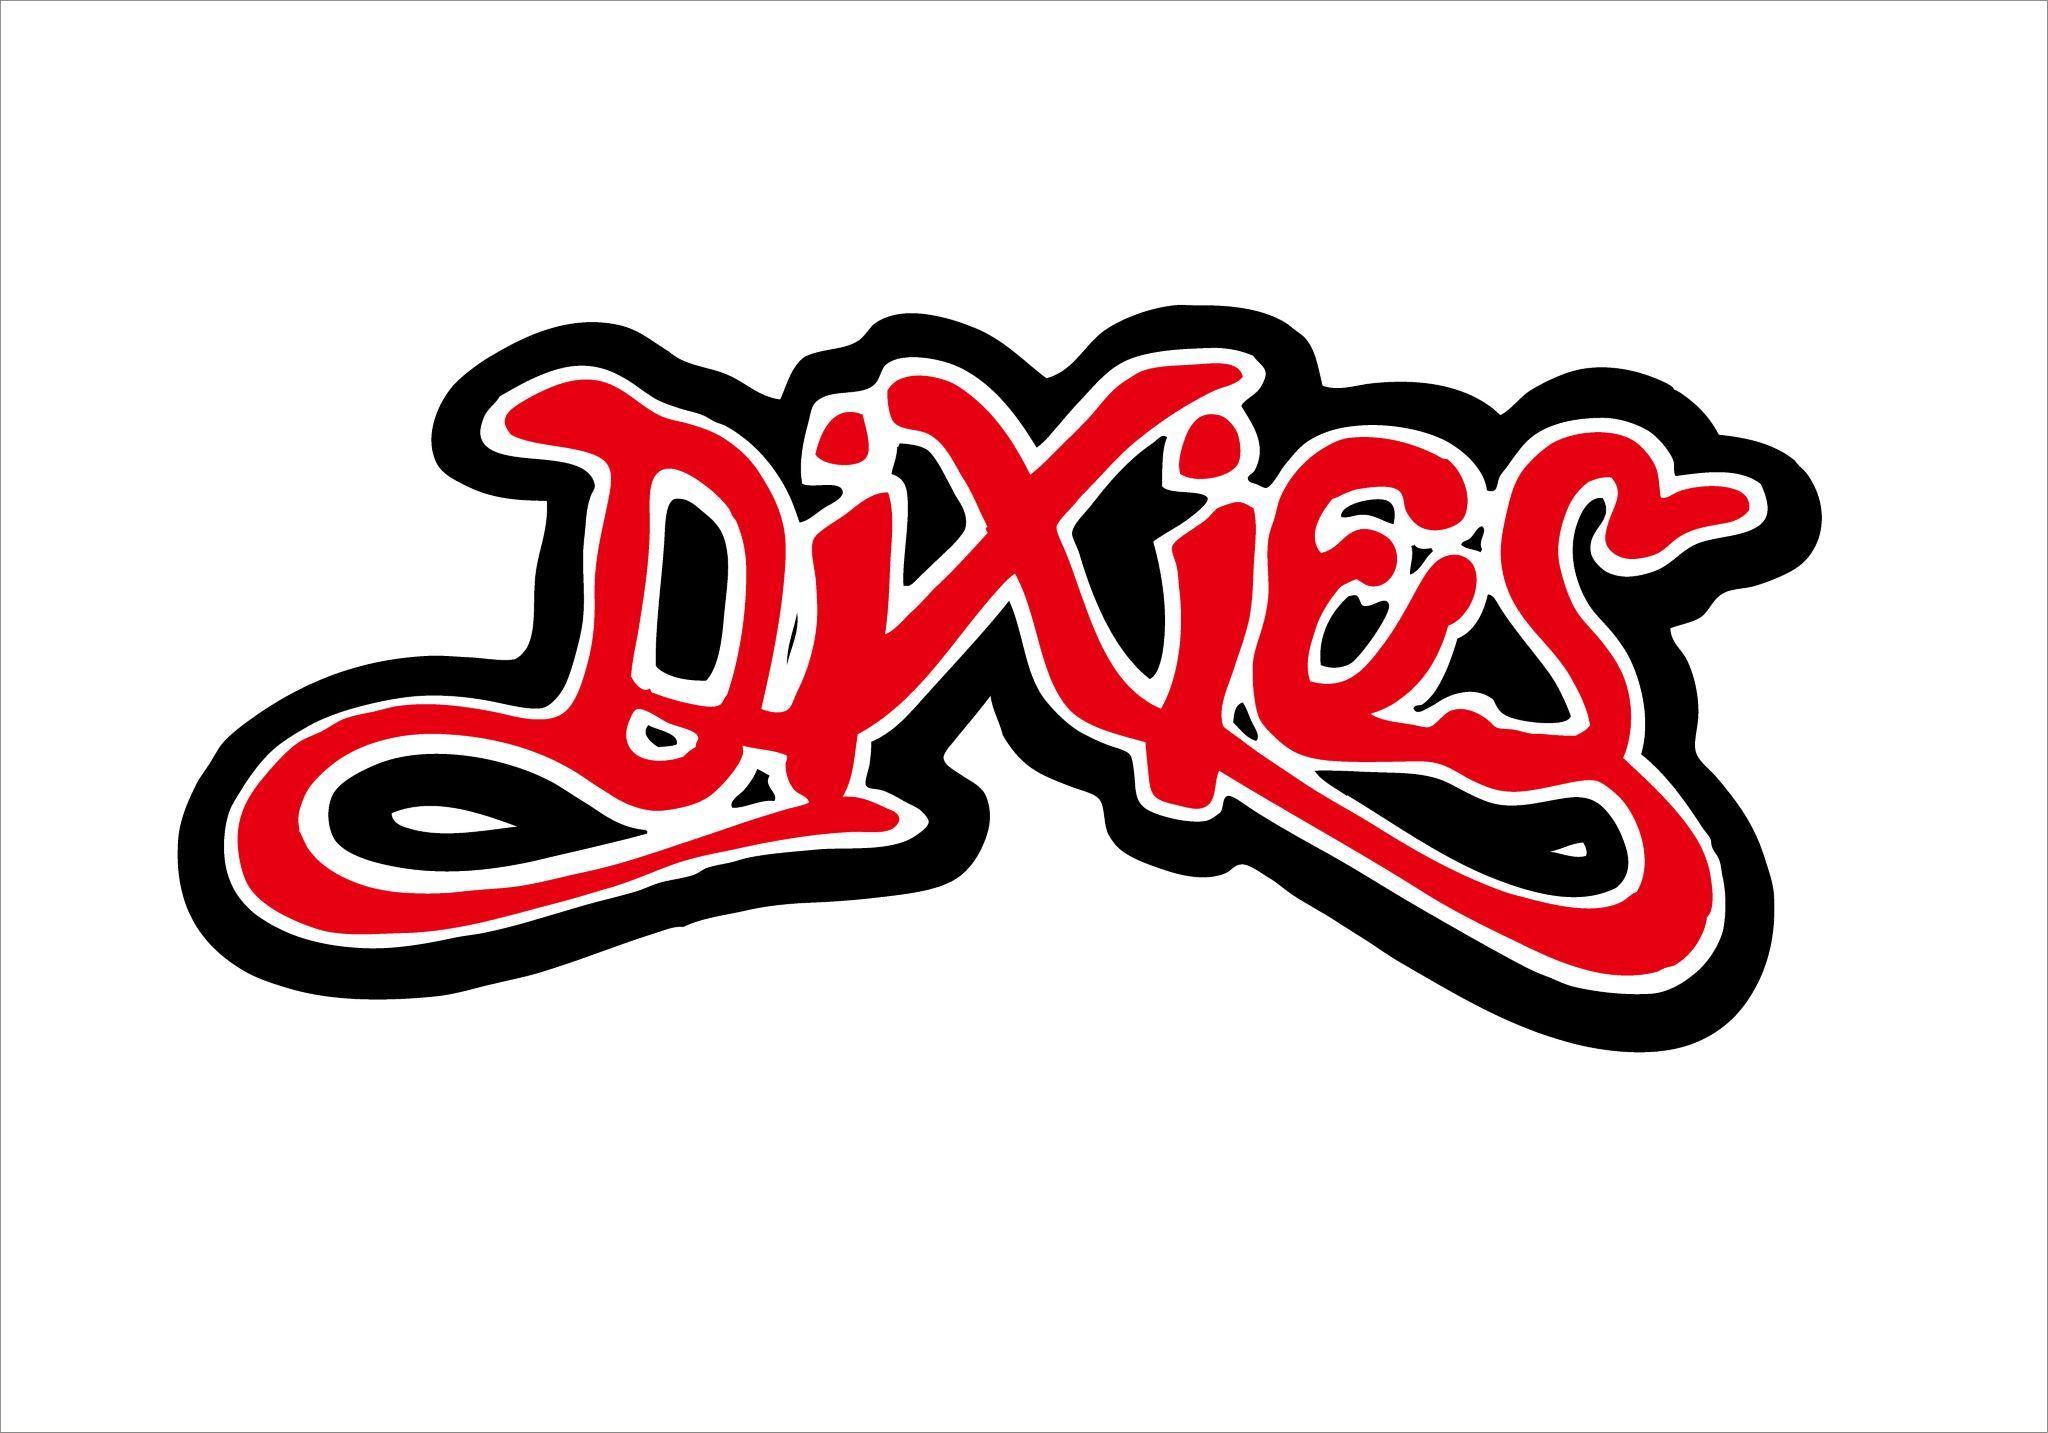 DIXIESのYOUTUBEチャンネル 【TUBE DIXIES】んの巻_f0236990_06104362.jpg